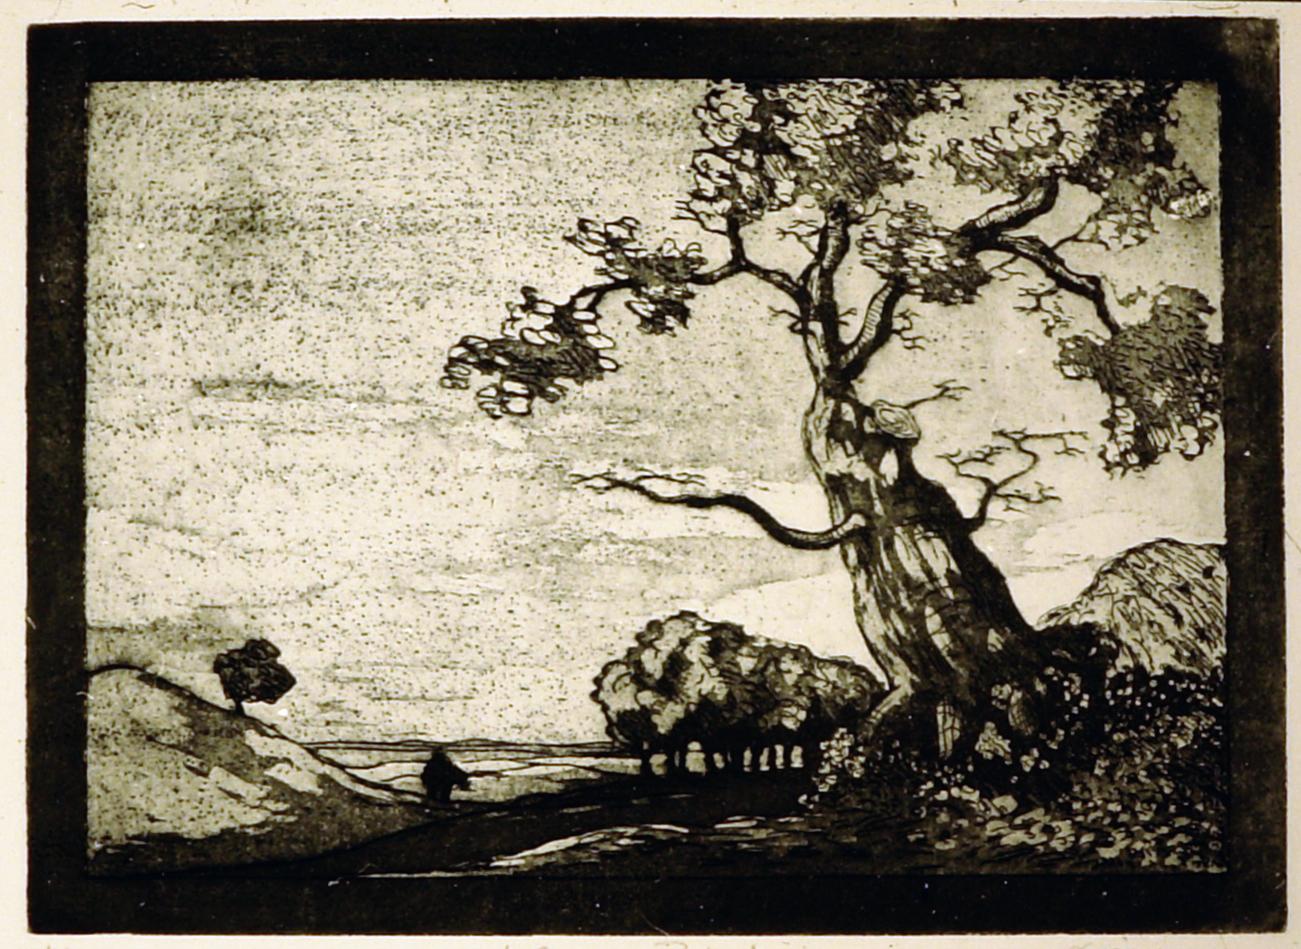 Printes motif